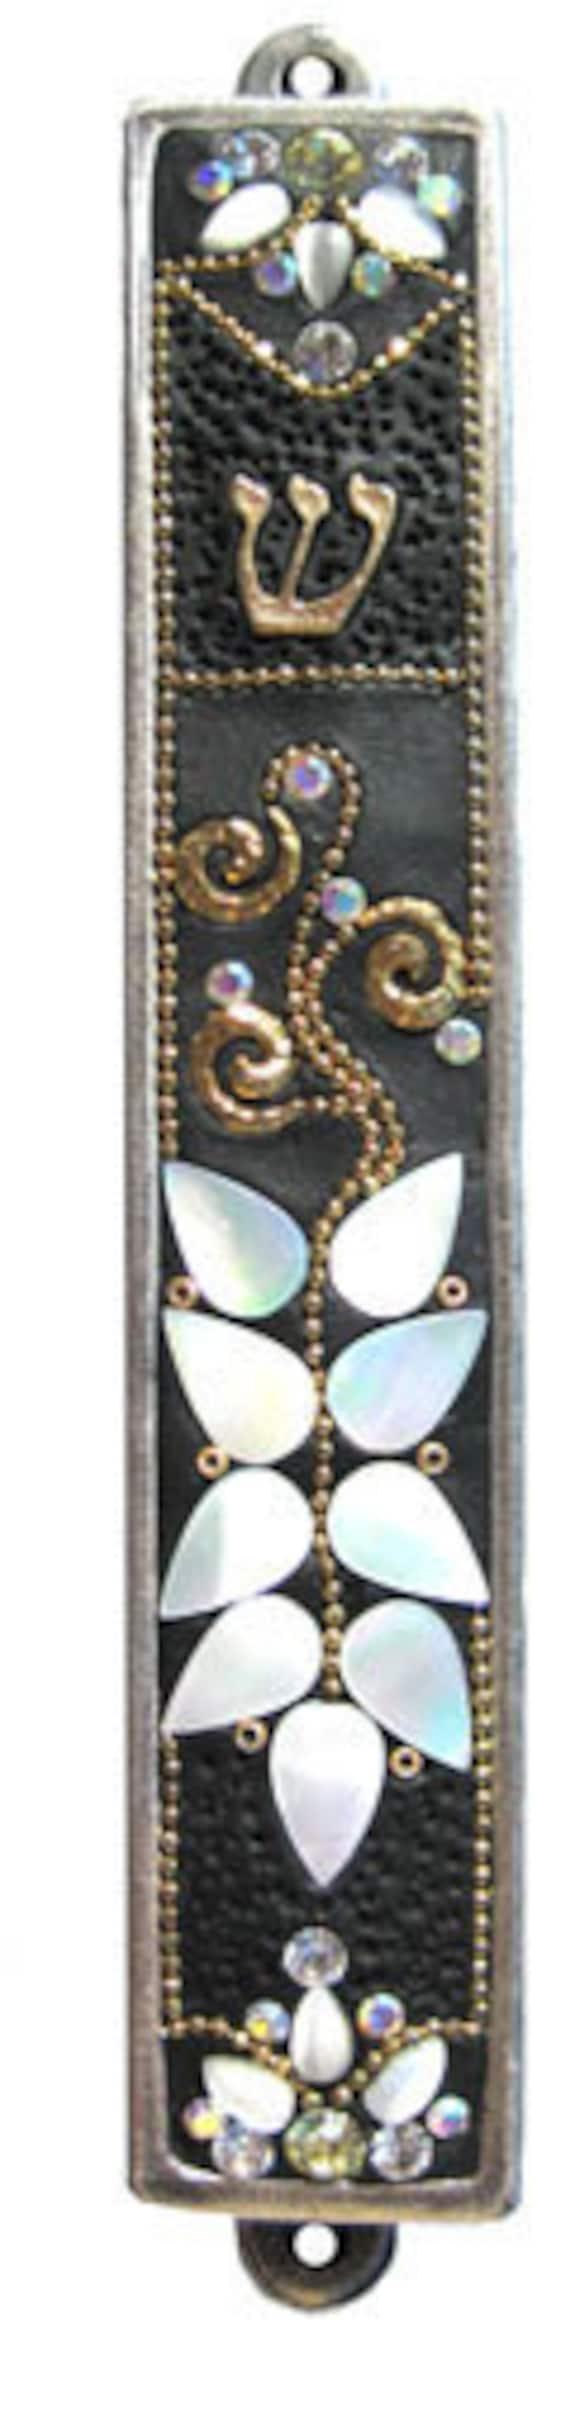 New Shell Mezuzah Handmade Art Flower Swarovski crystal GOLd Irina Smilansky